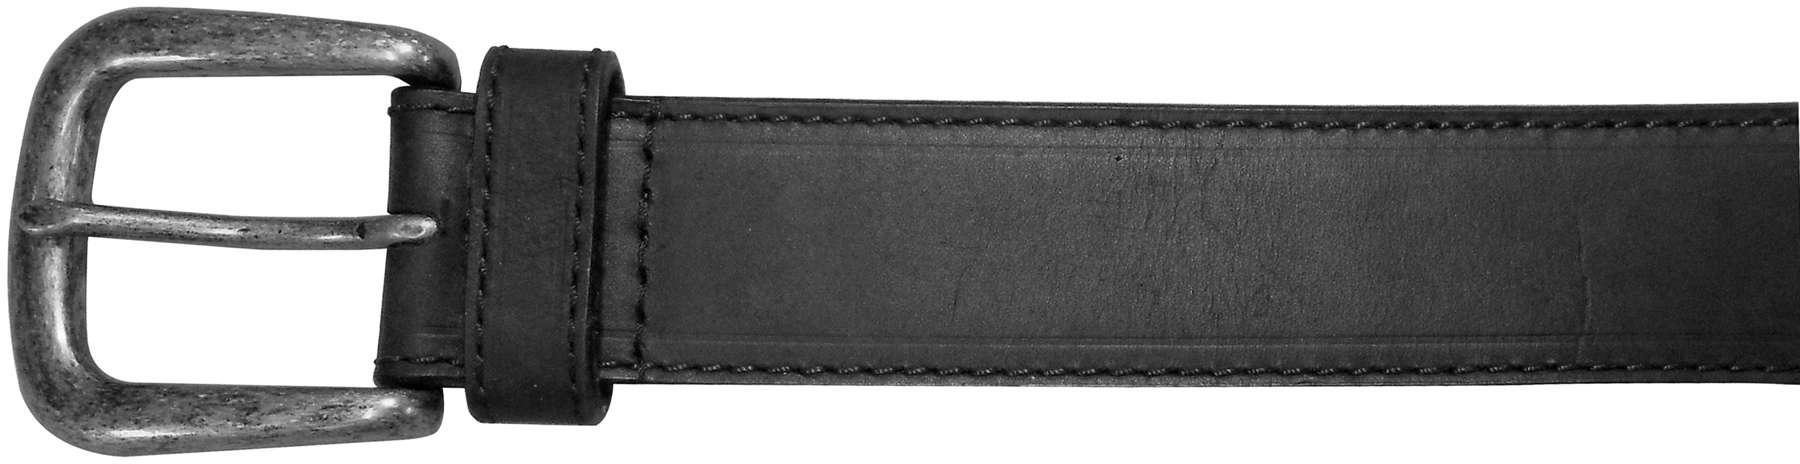 "10625410144 - 44"" Black Plain Field & Stream Leather Belt"